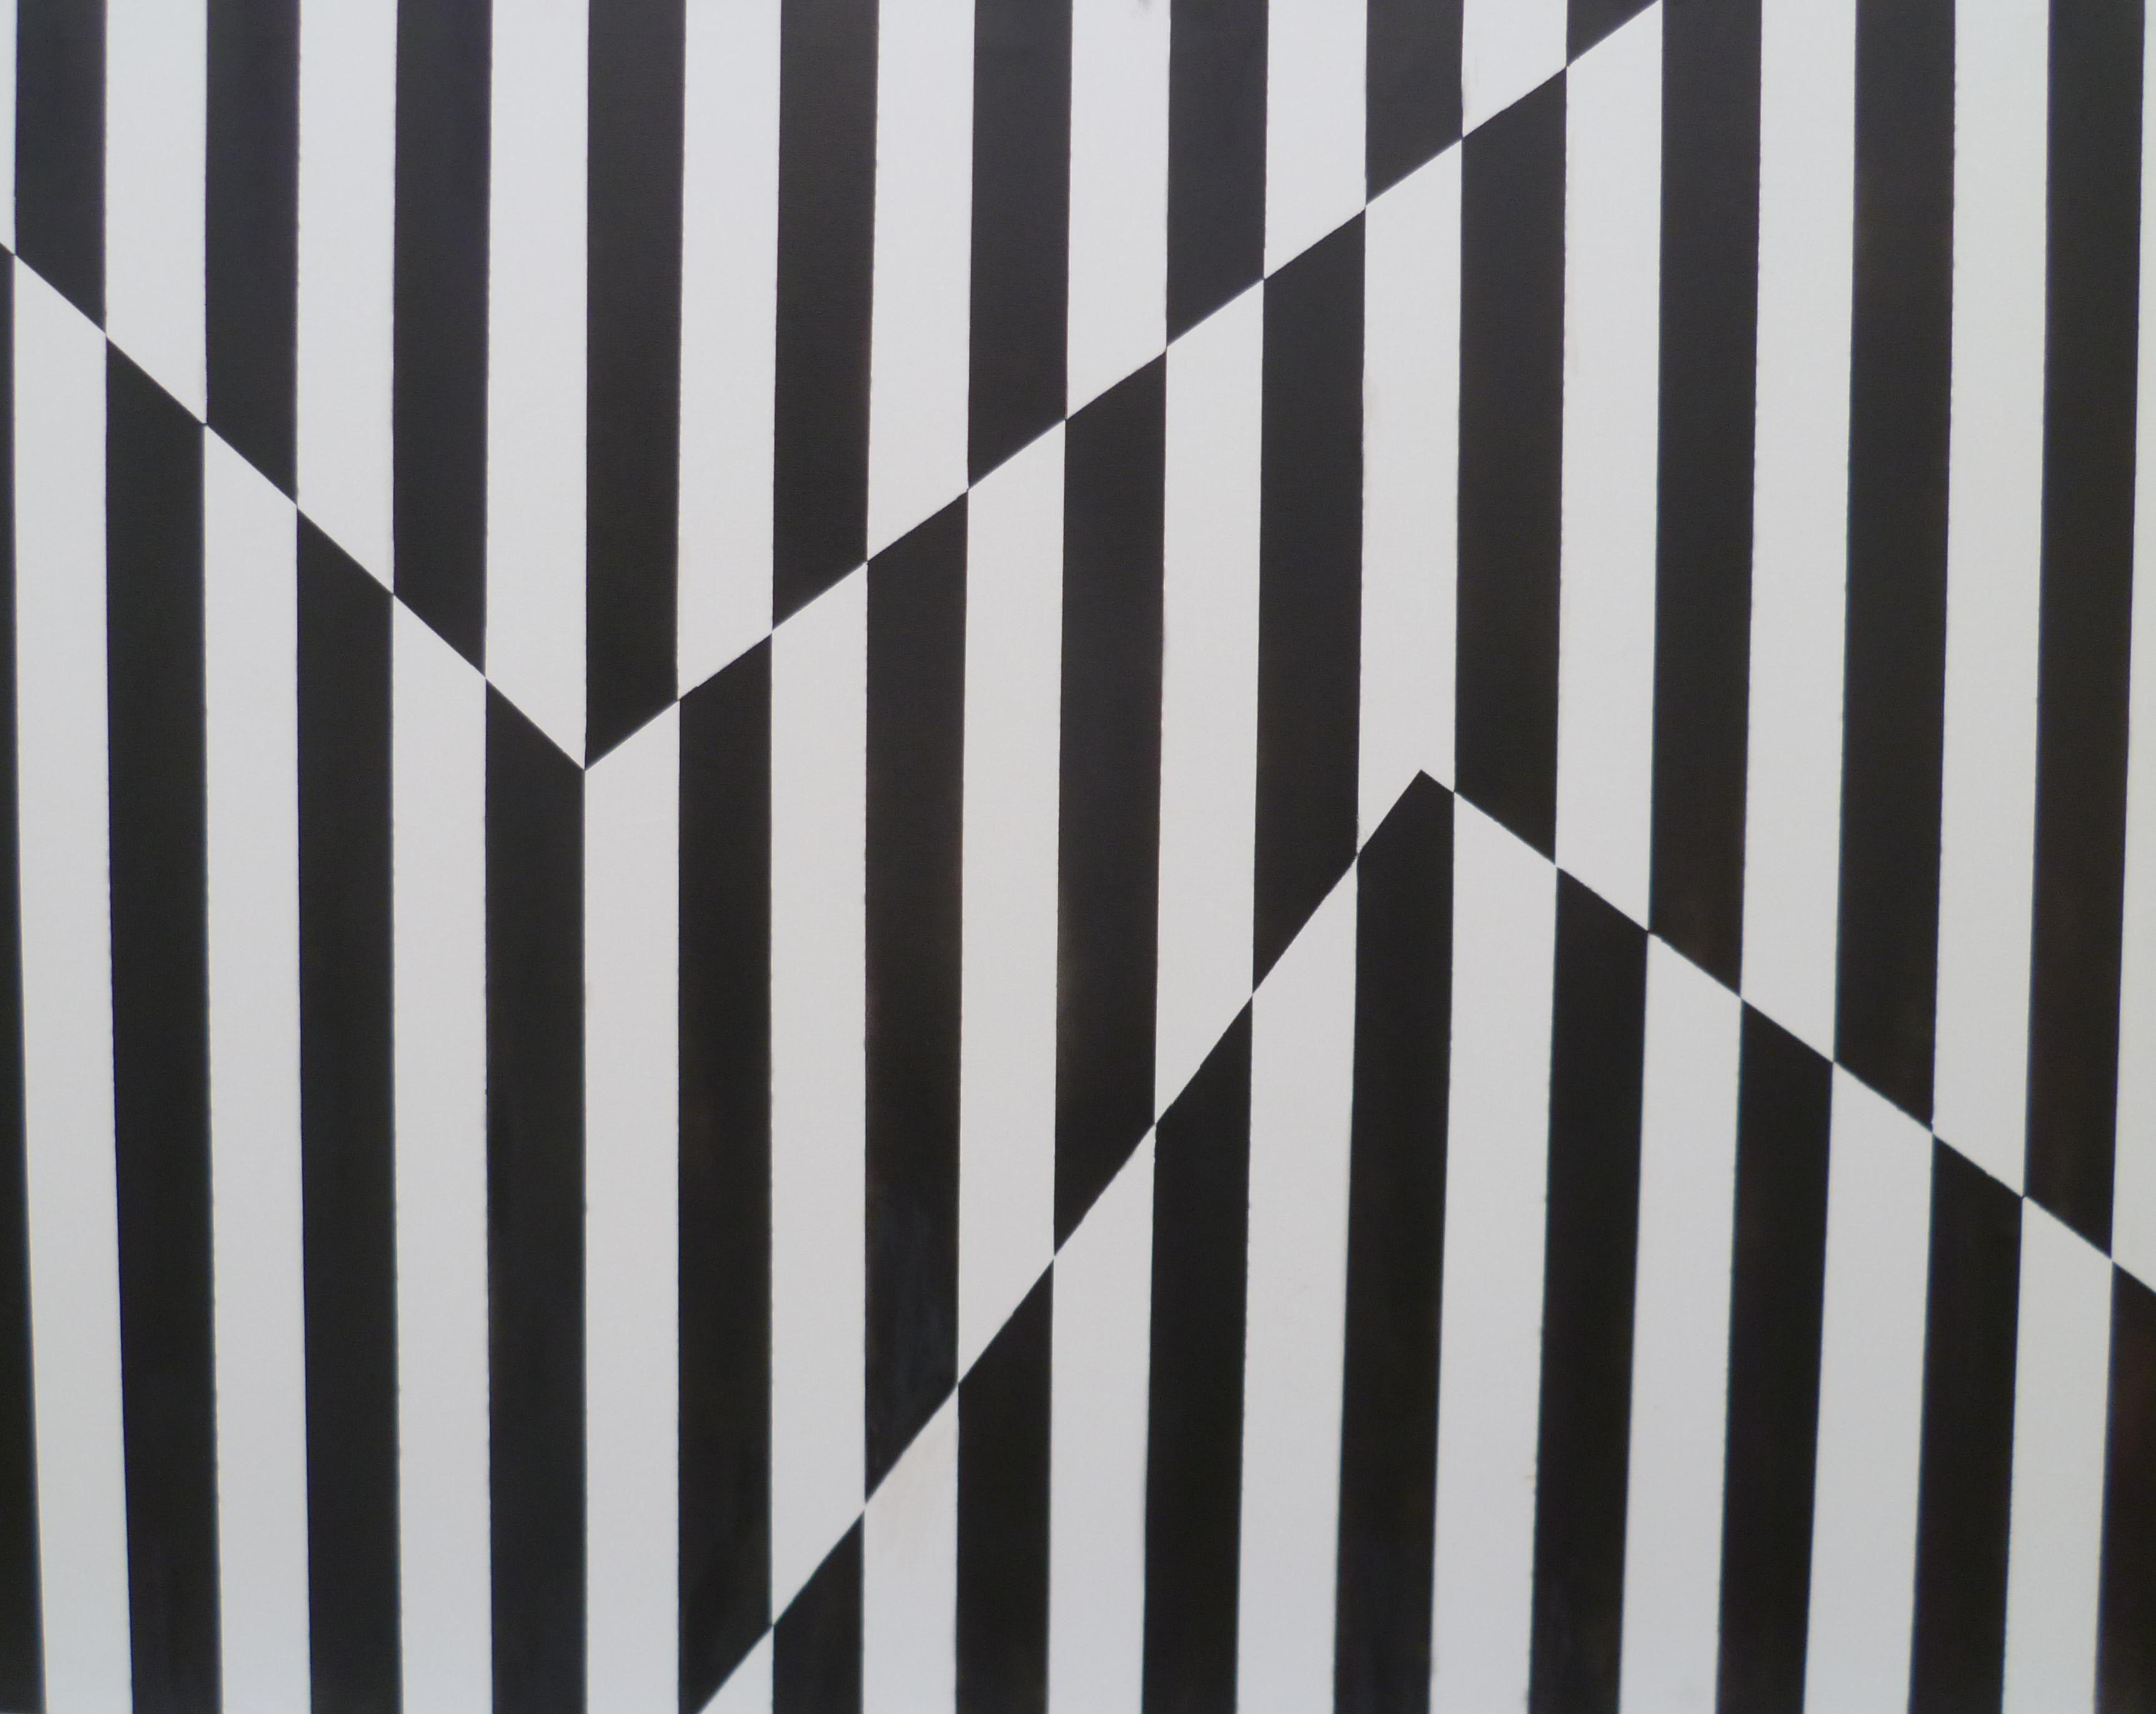 Carmen Herrera - Black and white - Cuba Art - Artwork Details